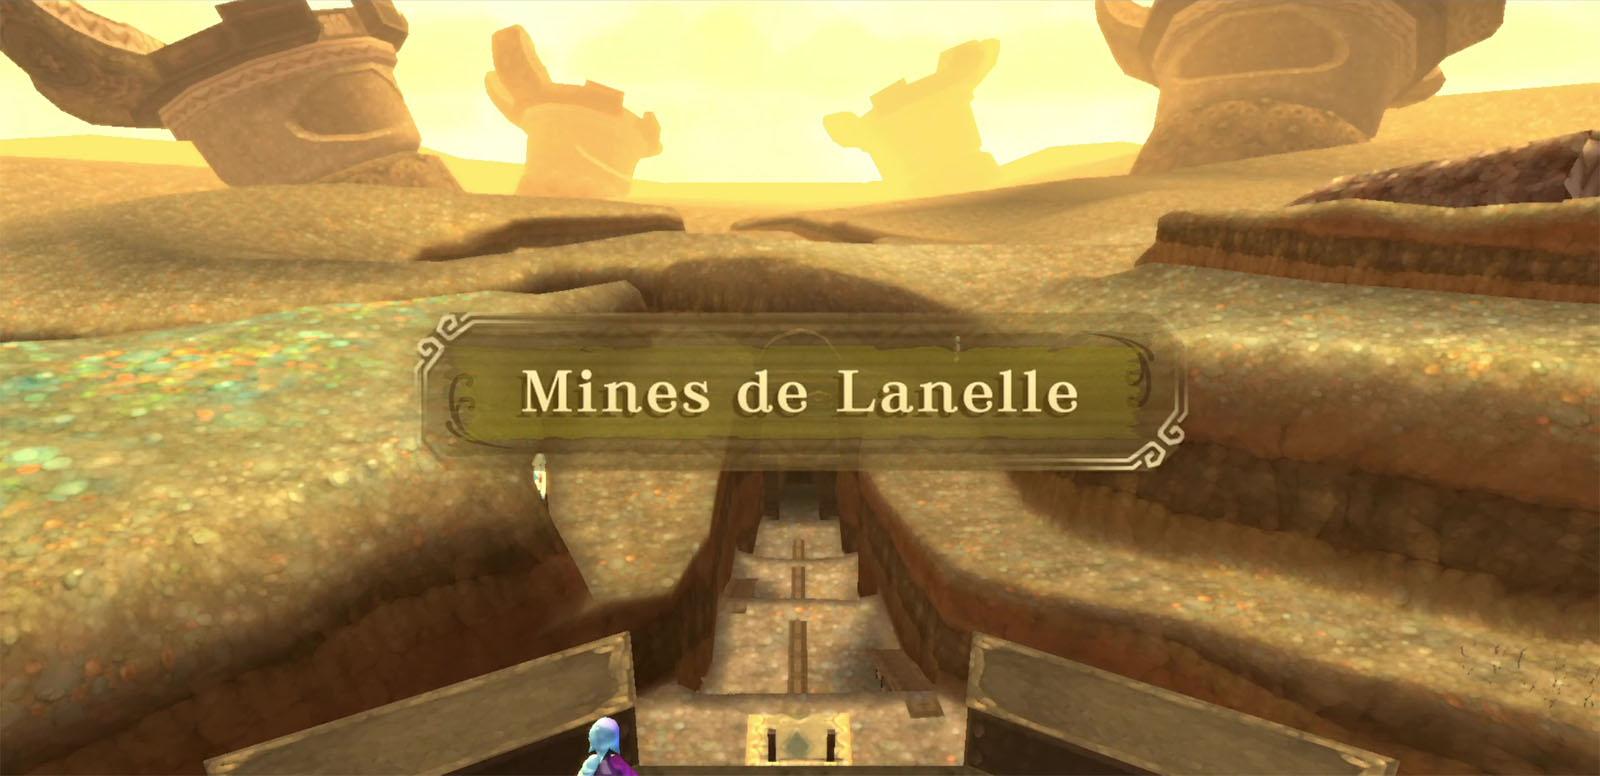 Soluce des mines de Lanelle dans The Legend of Zelda: Skyward Sword